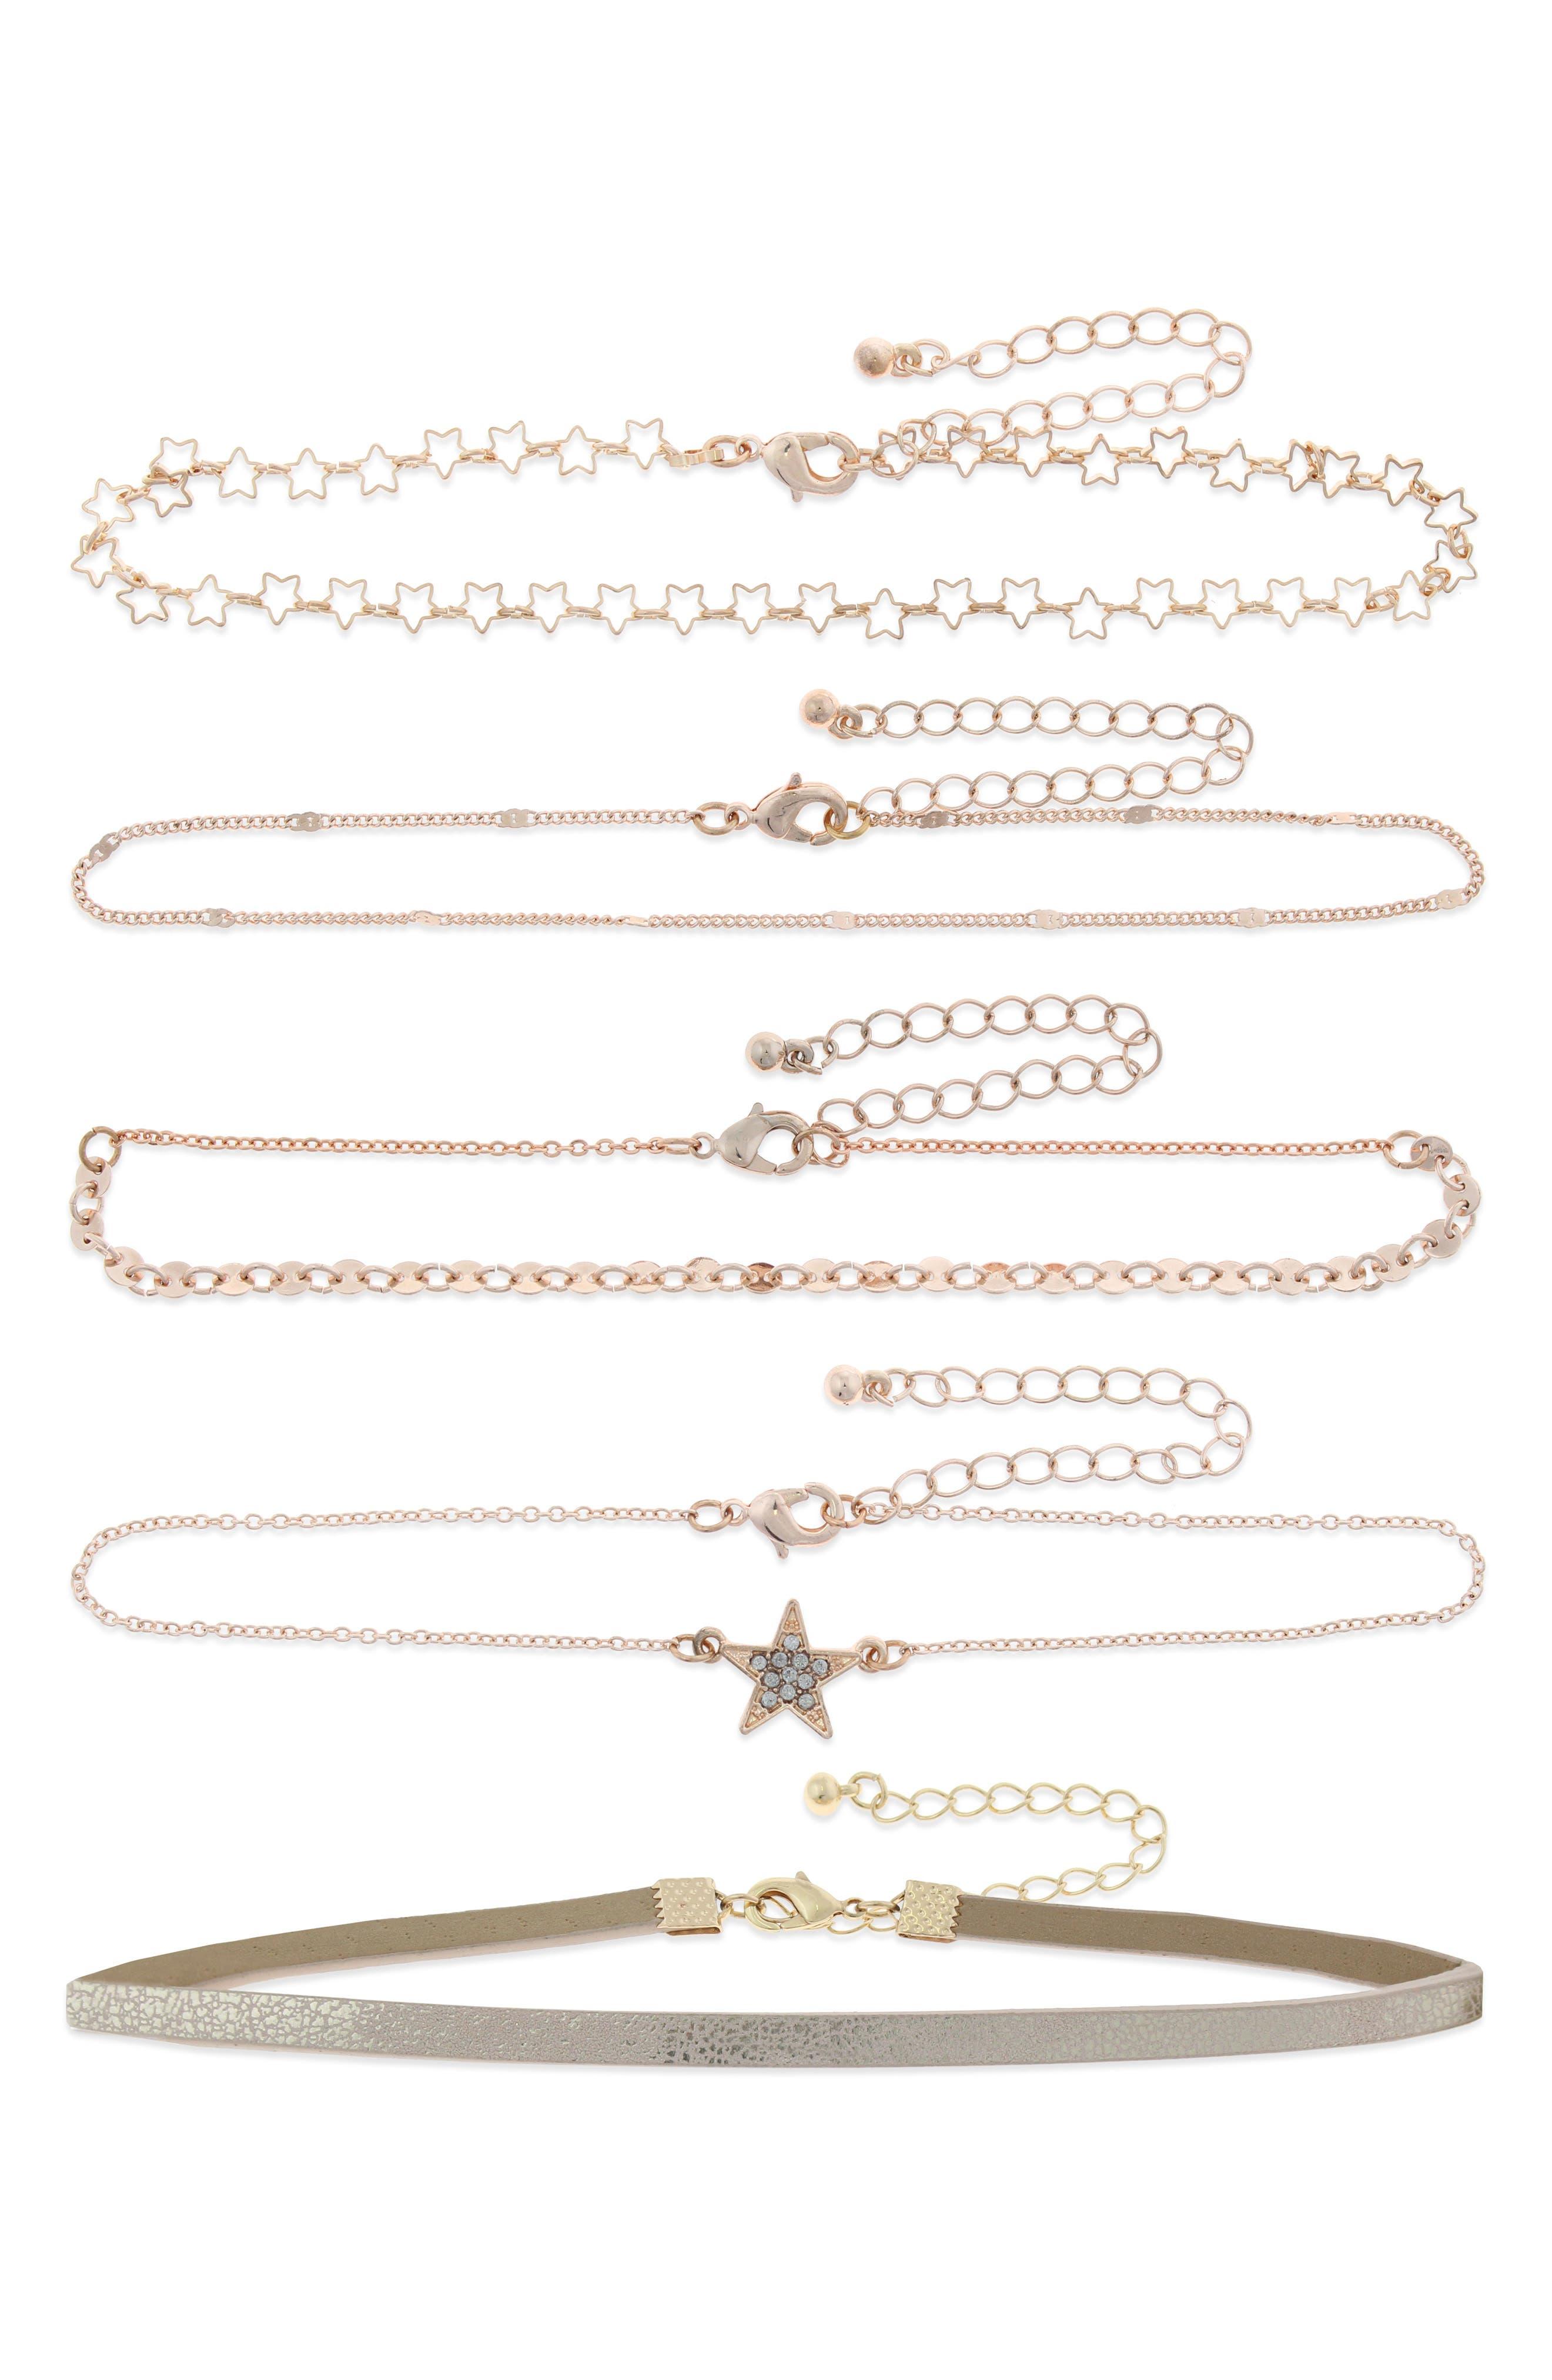 Set of 5 Choker Necklaces,                             Main thumbnail 1, color,                             712